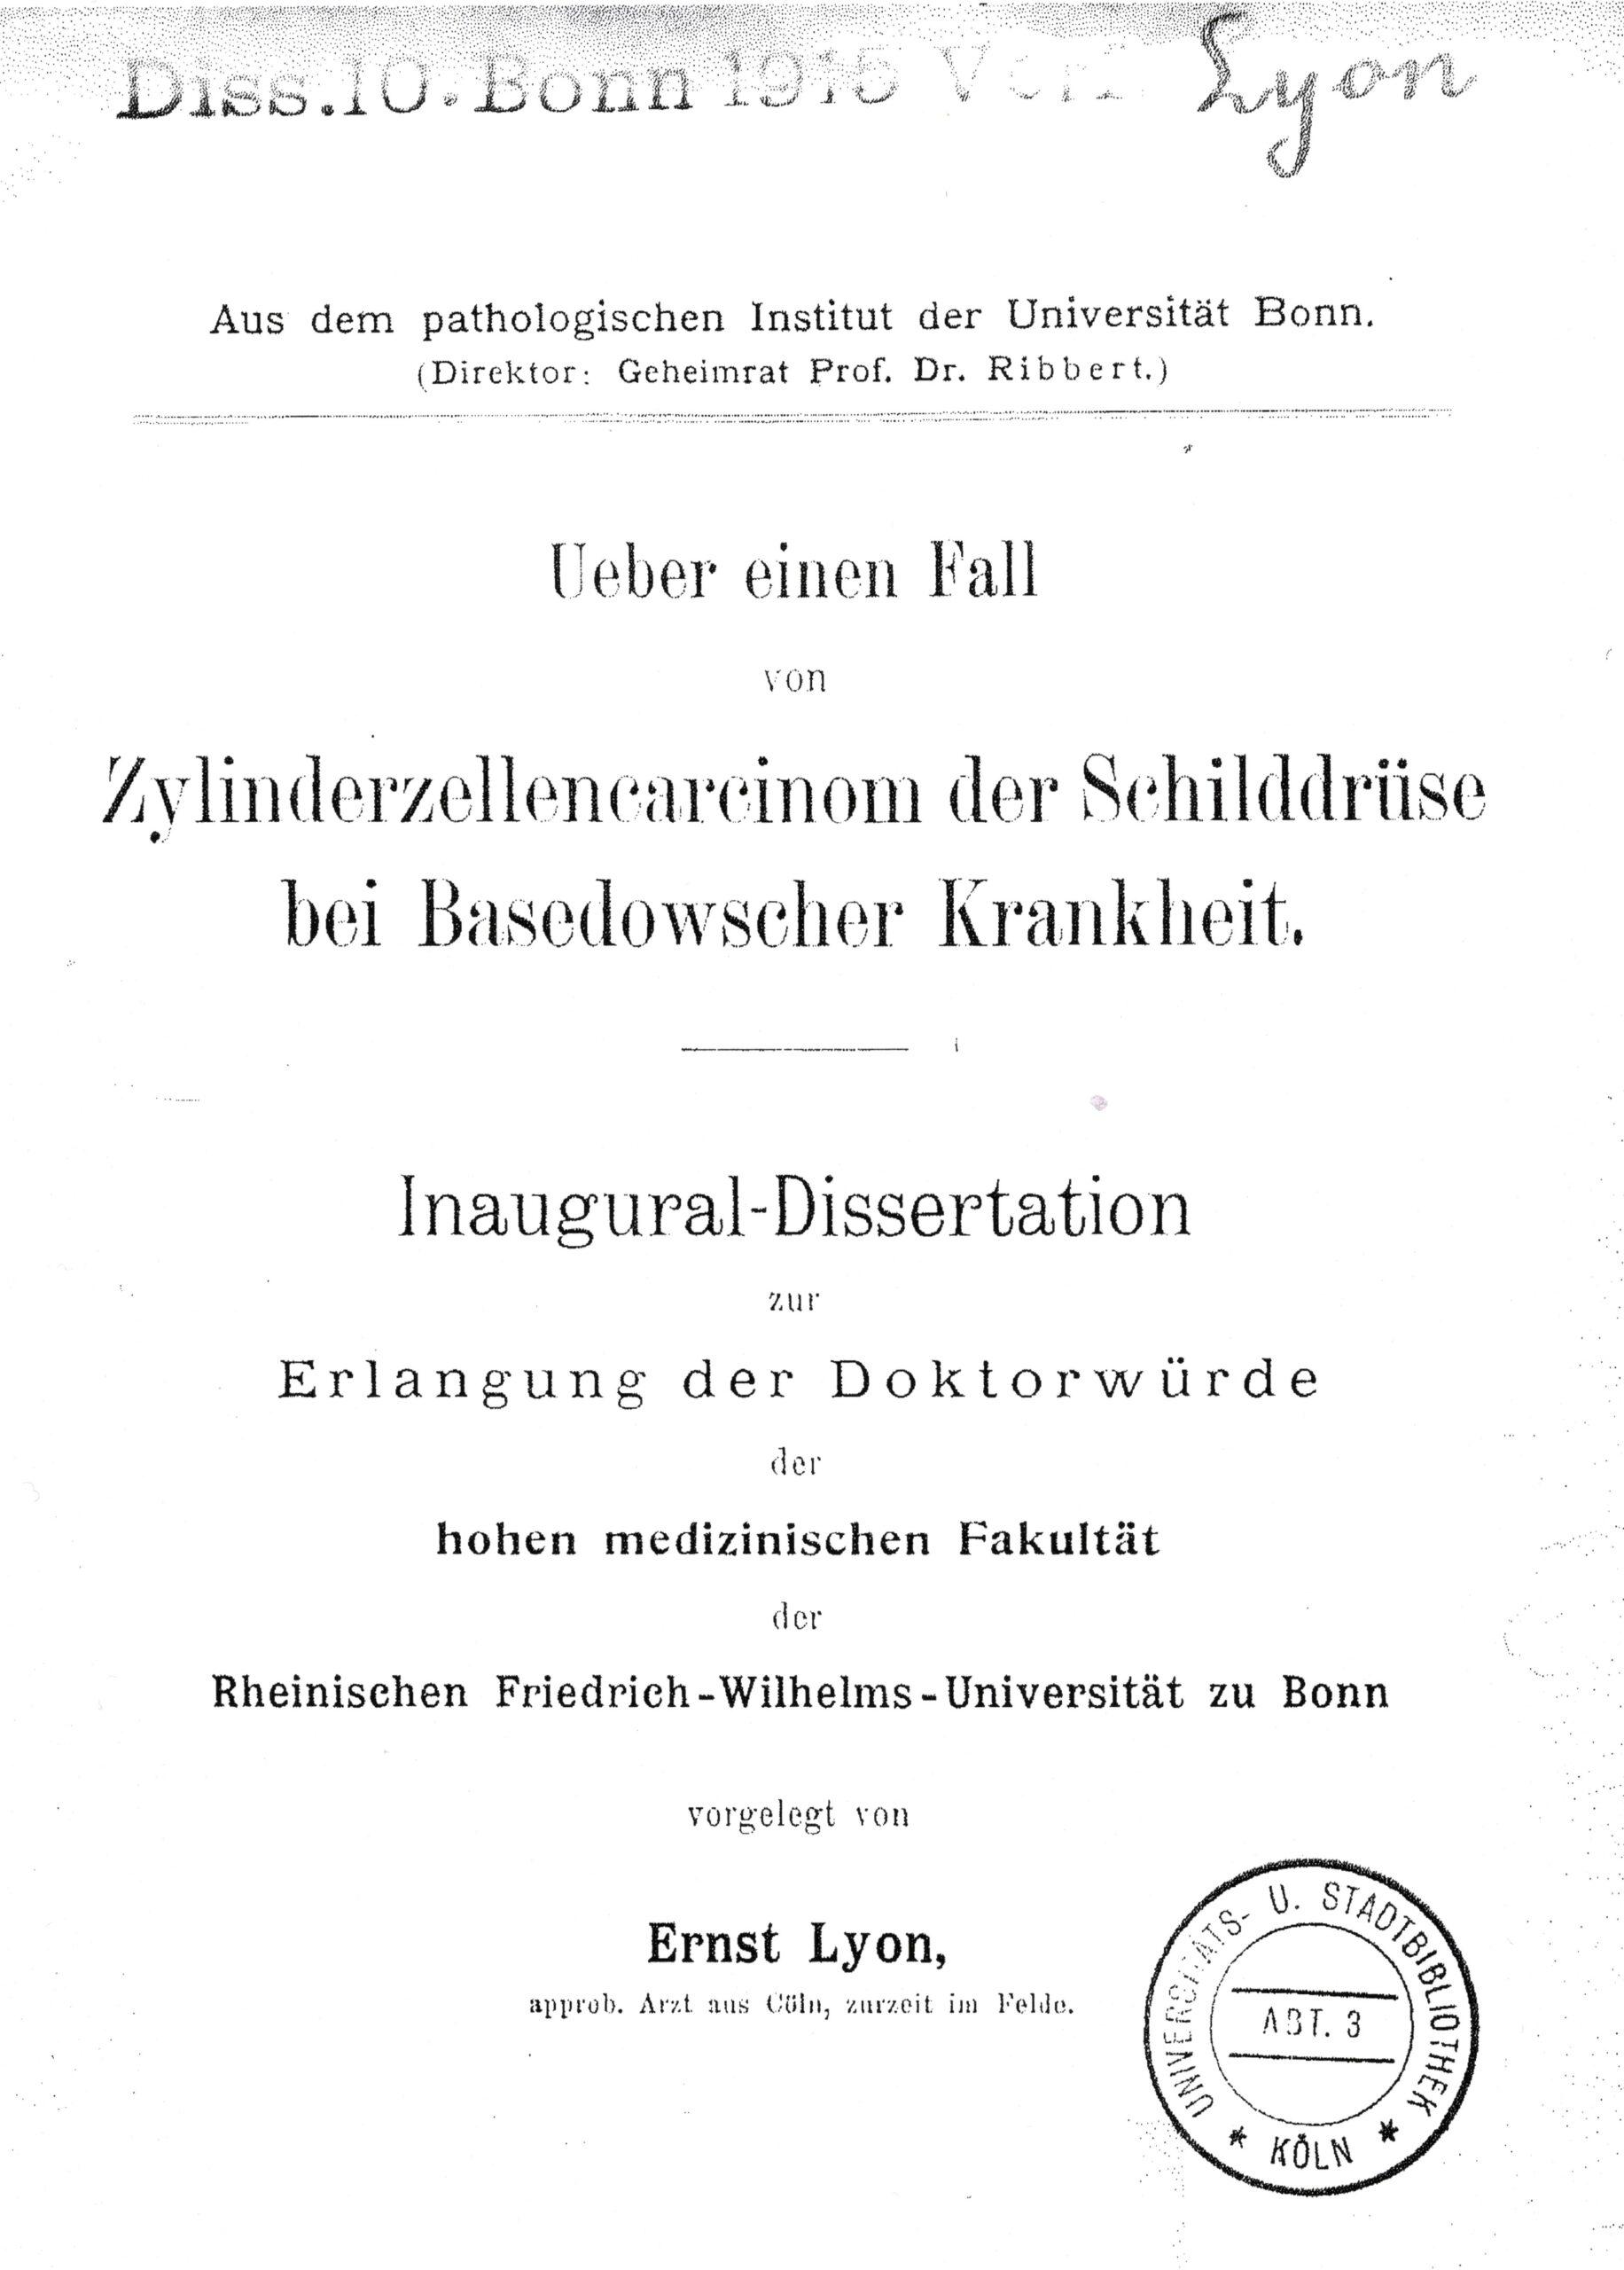 Dissertation, Bonn 1915